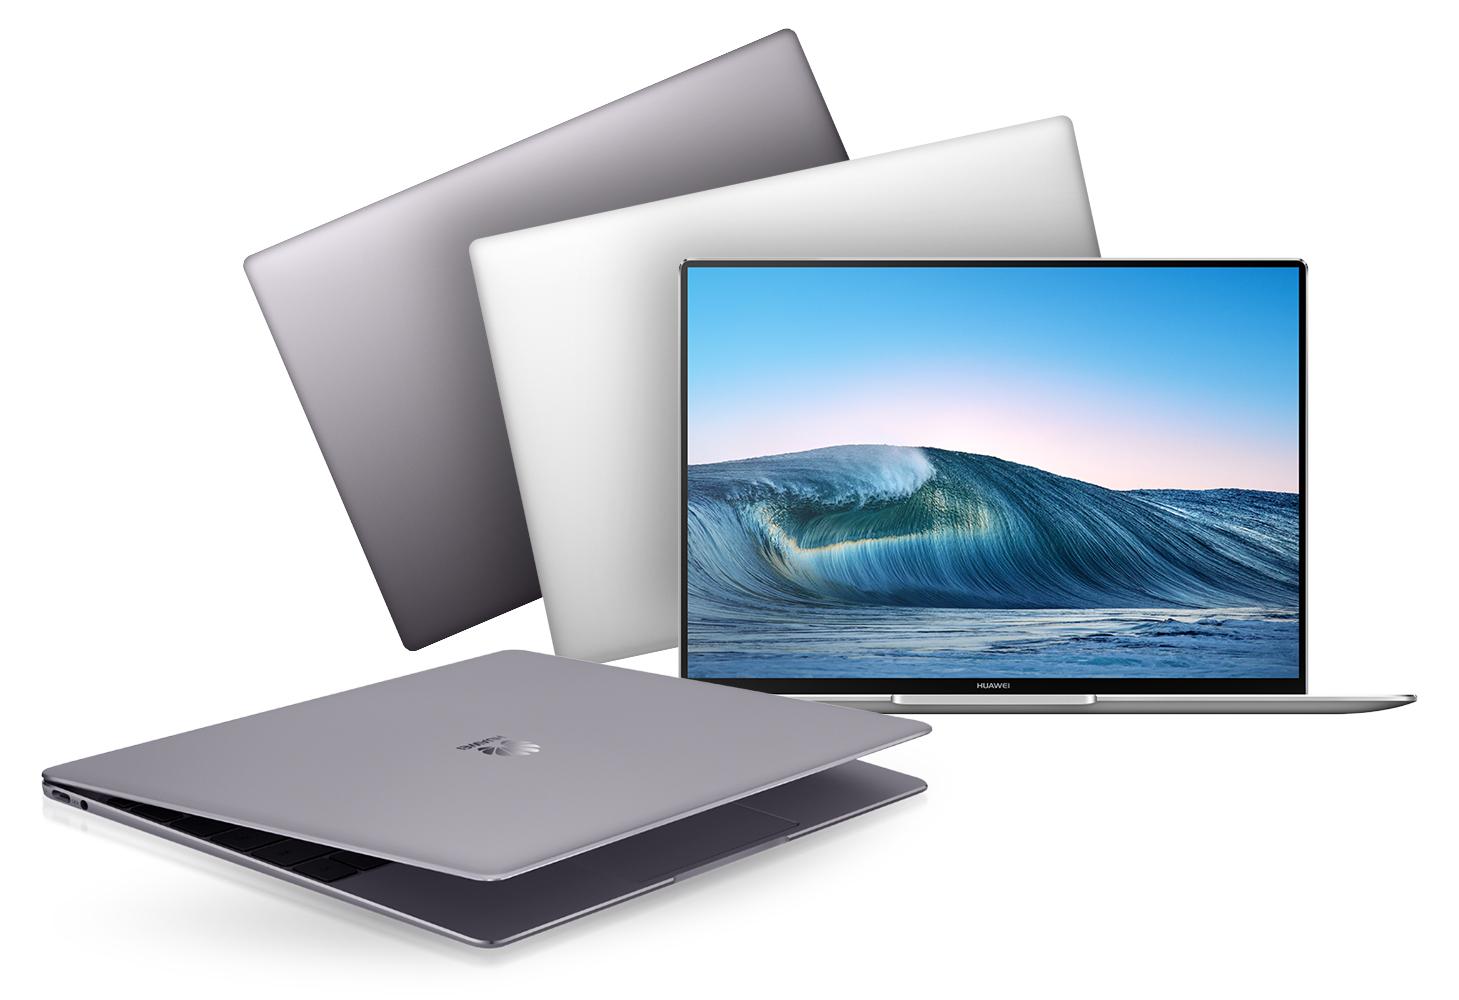 Huawei MateBook Factory reset